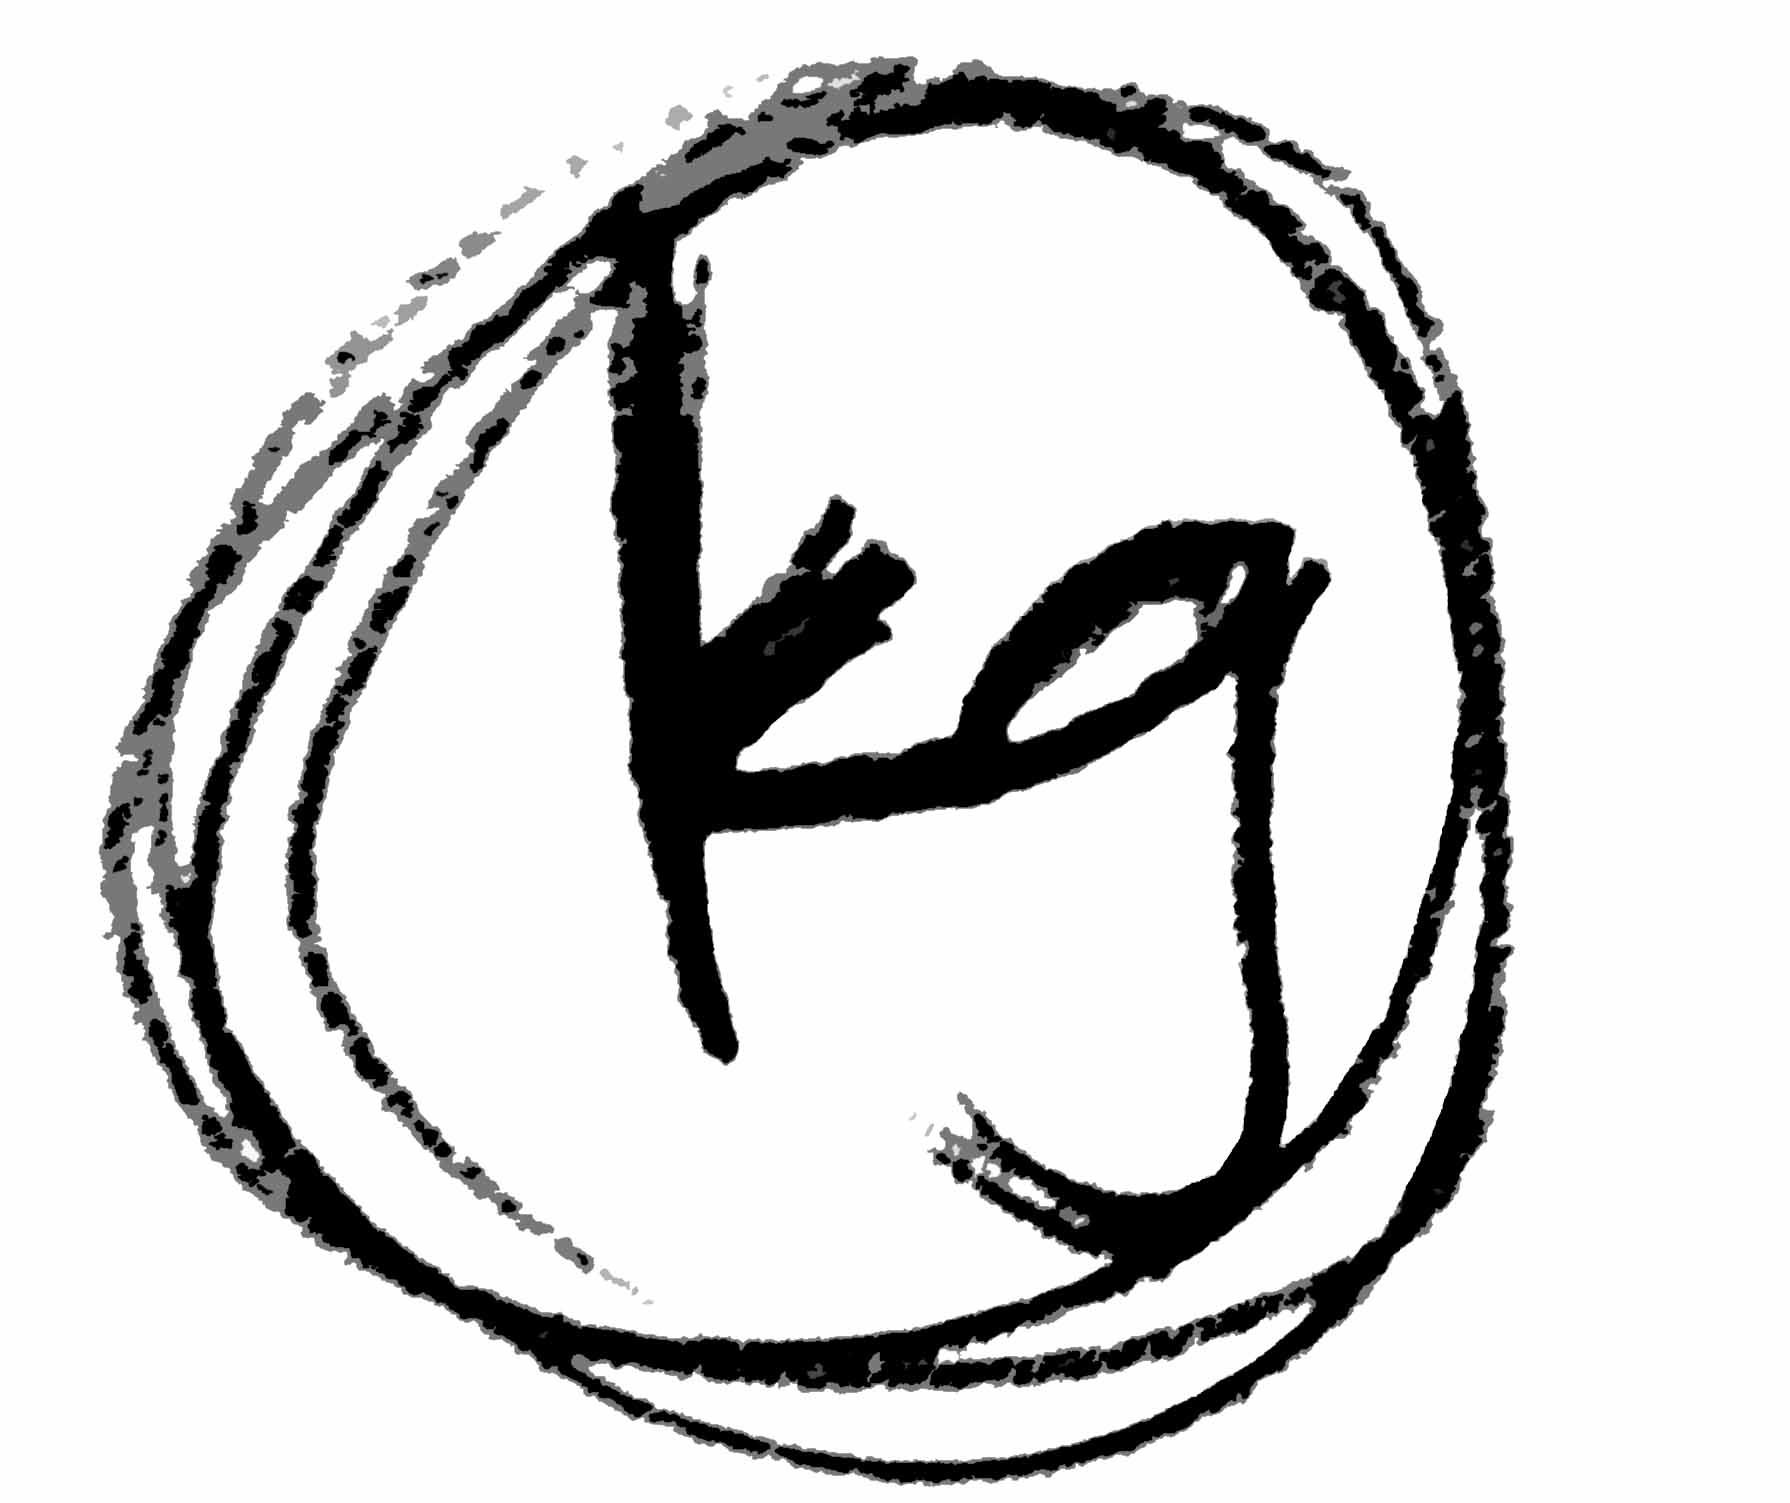 Kina Grannis Kg Logo Pinterest Radio Wave Diagram Http Hollywoodbollywood Co In Hoadmin